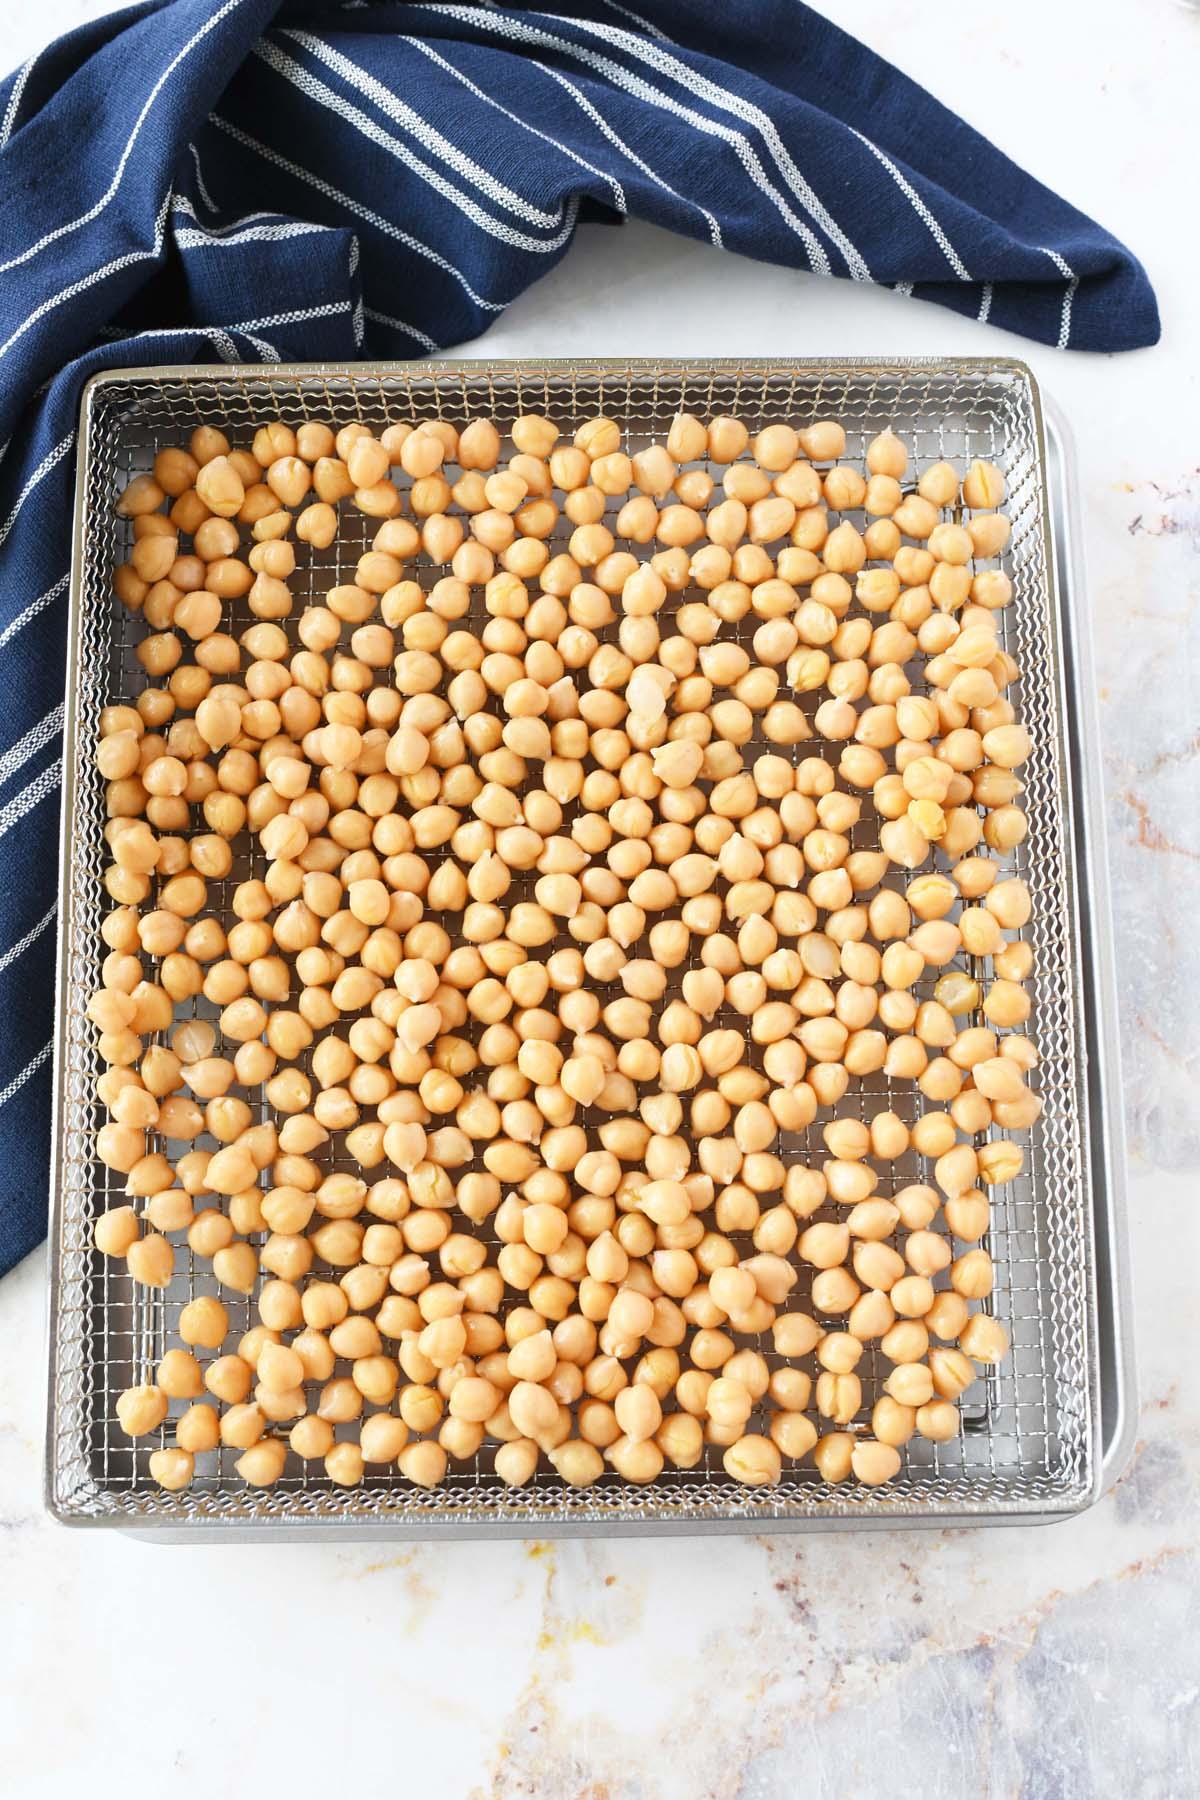 Air Fried Garbanzo beans on a tray.